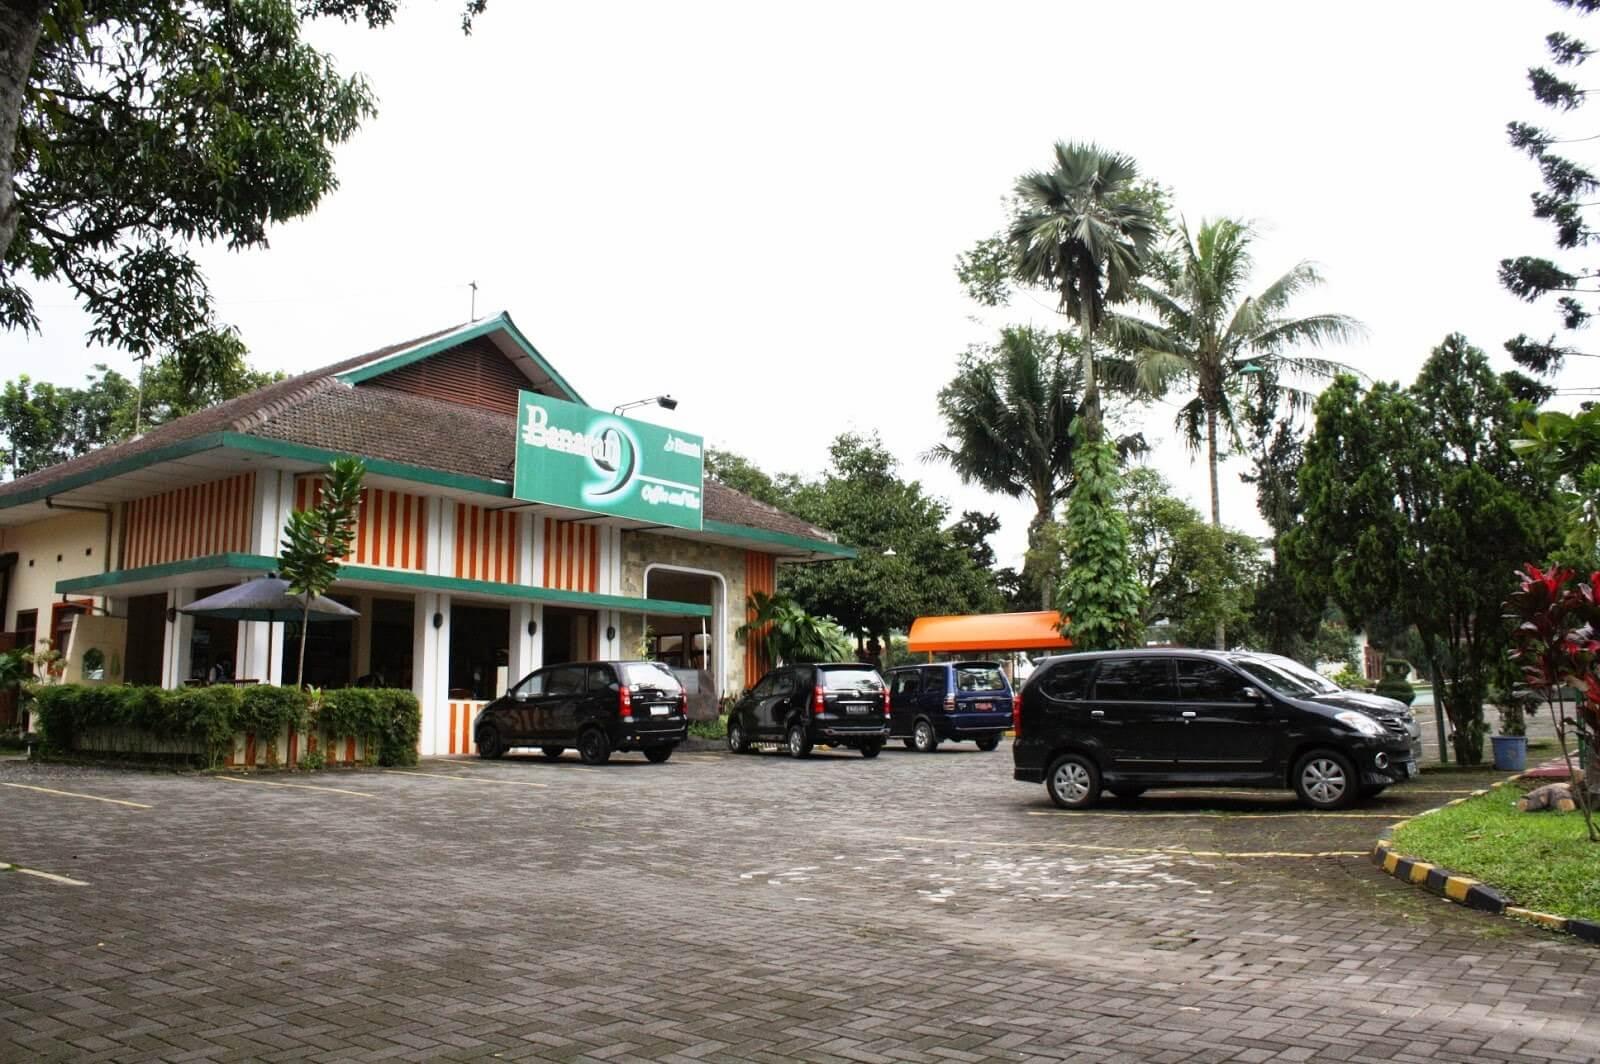 Wisata Kampoeng Kopi Banaran Semarang Kab